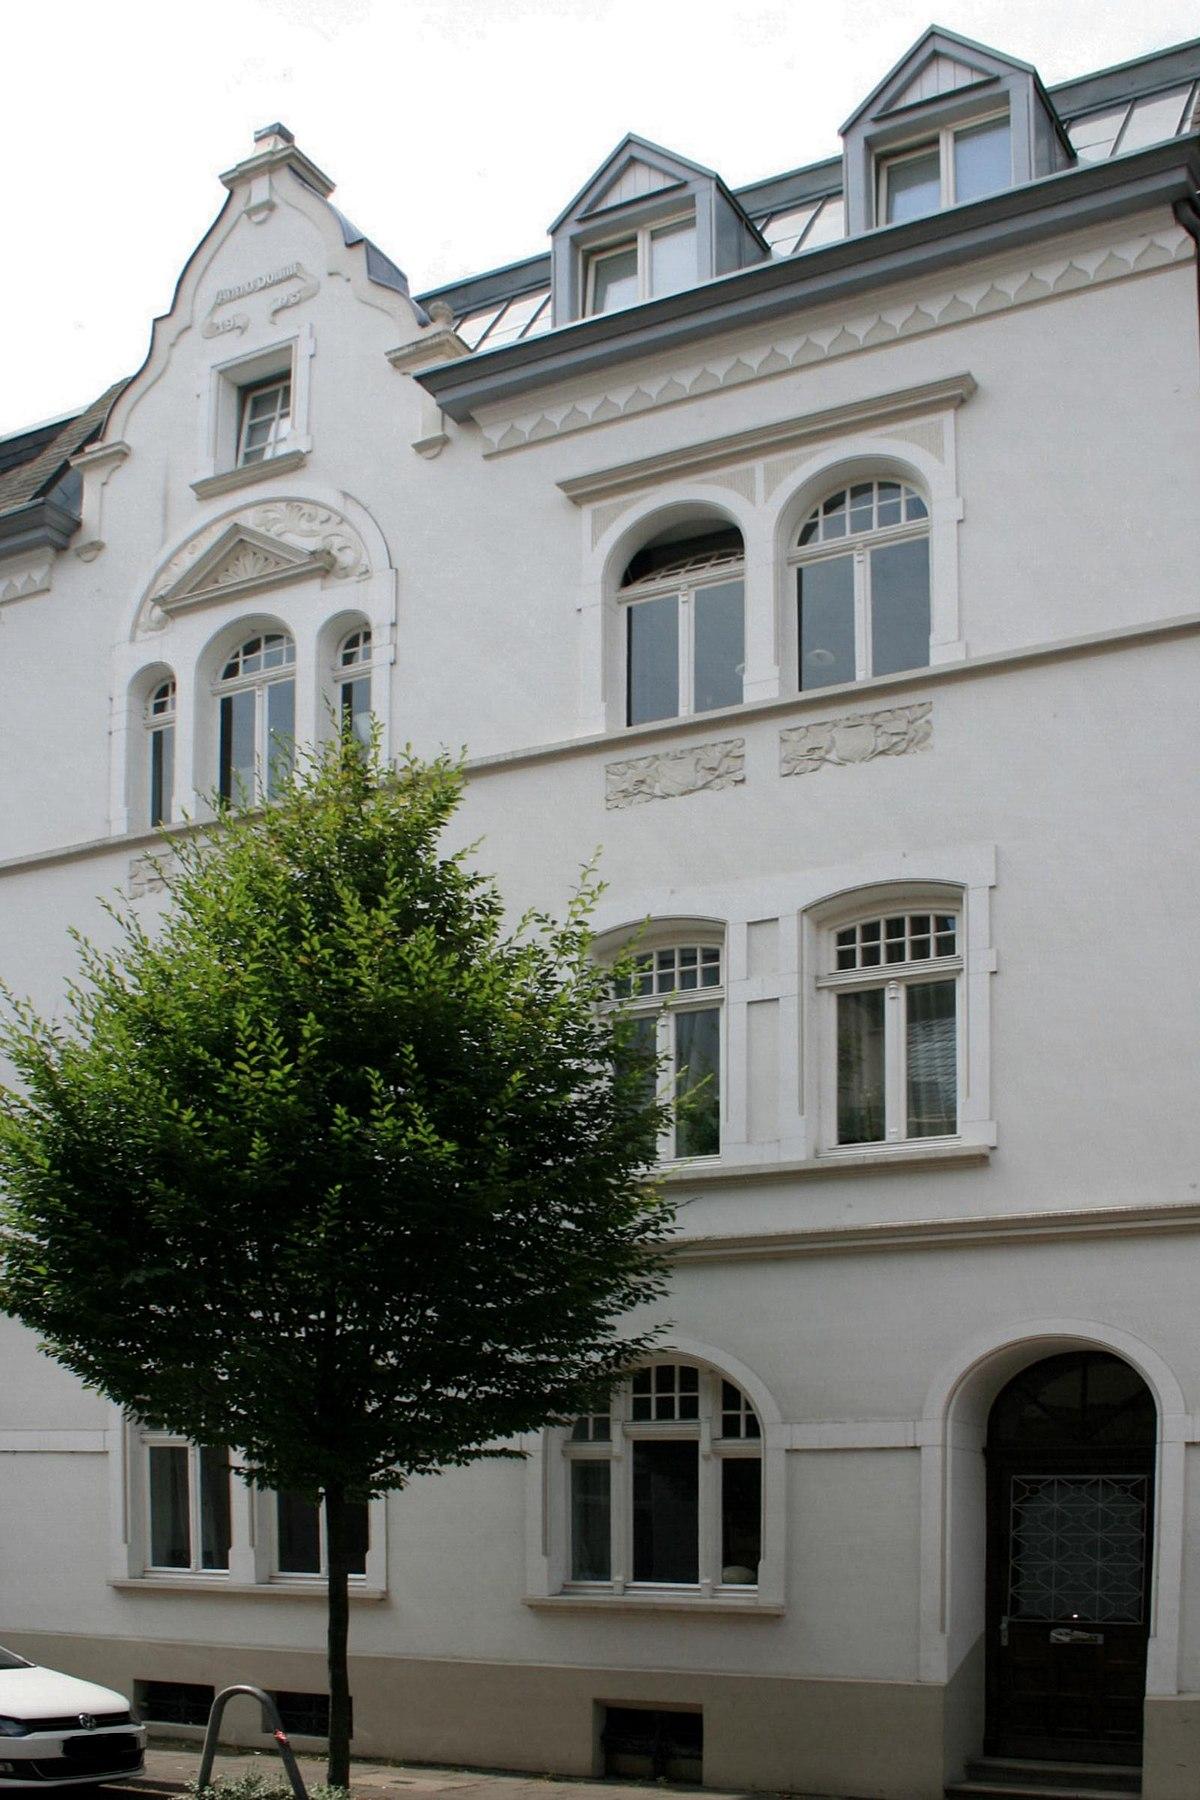 Fenster M Nchengladbach bylandtstraße 24 mönchengladbach